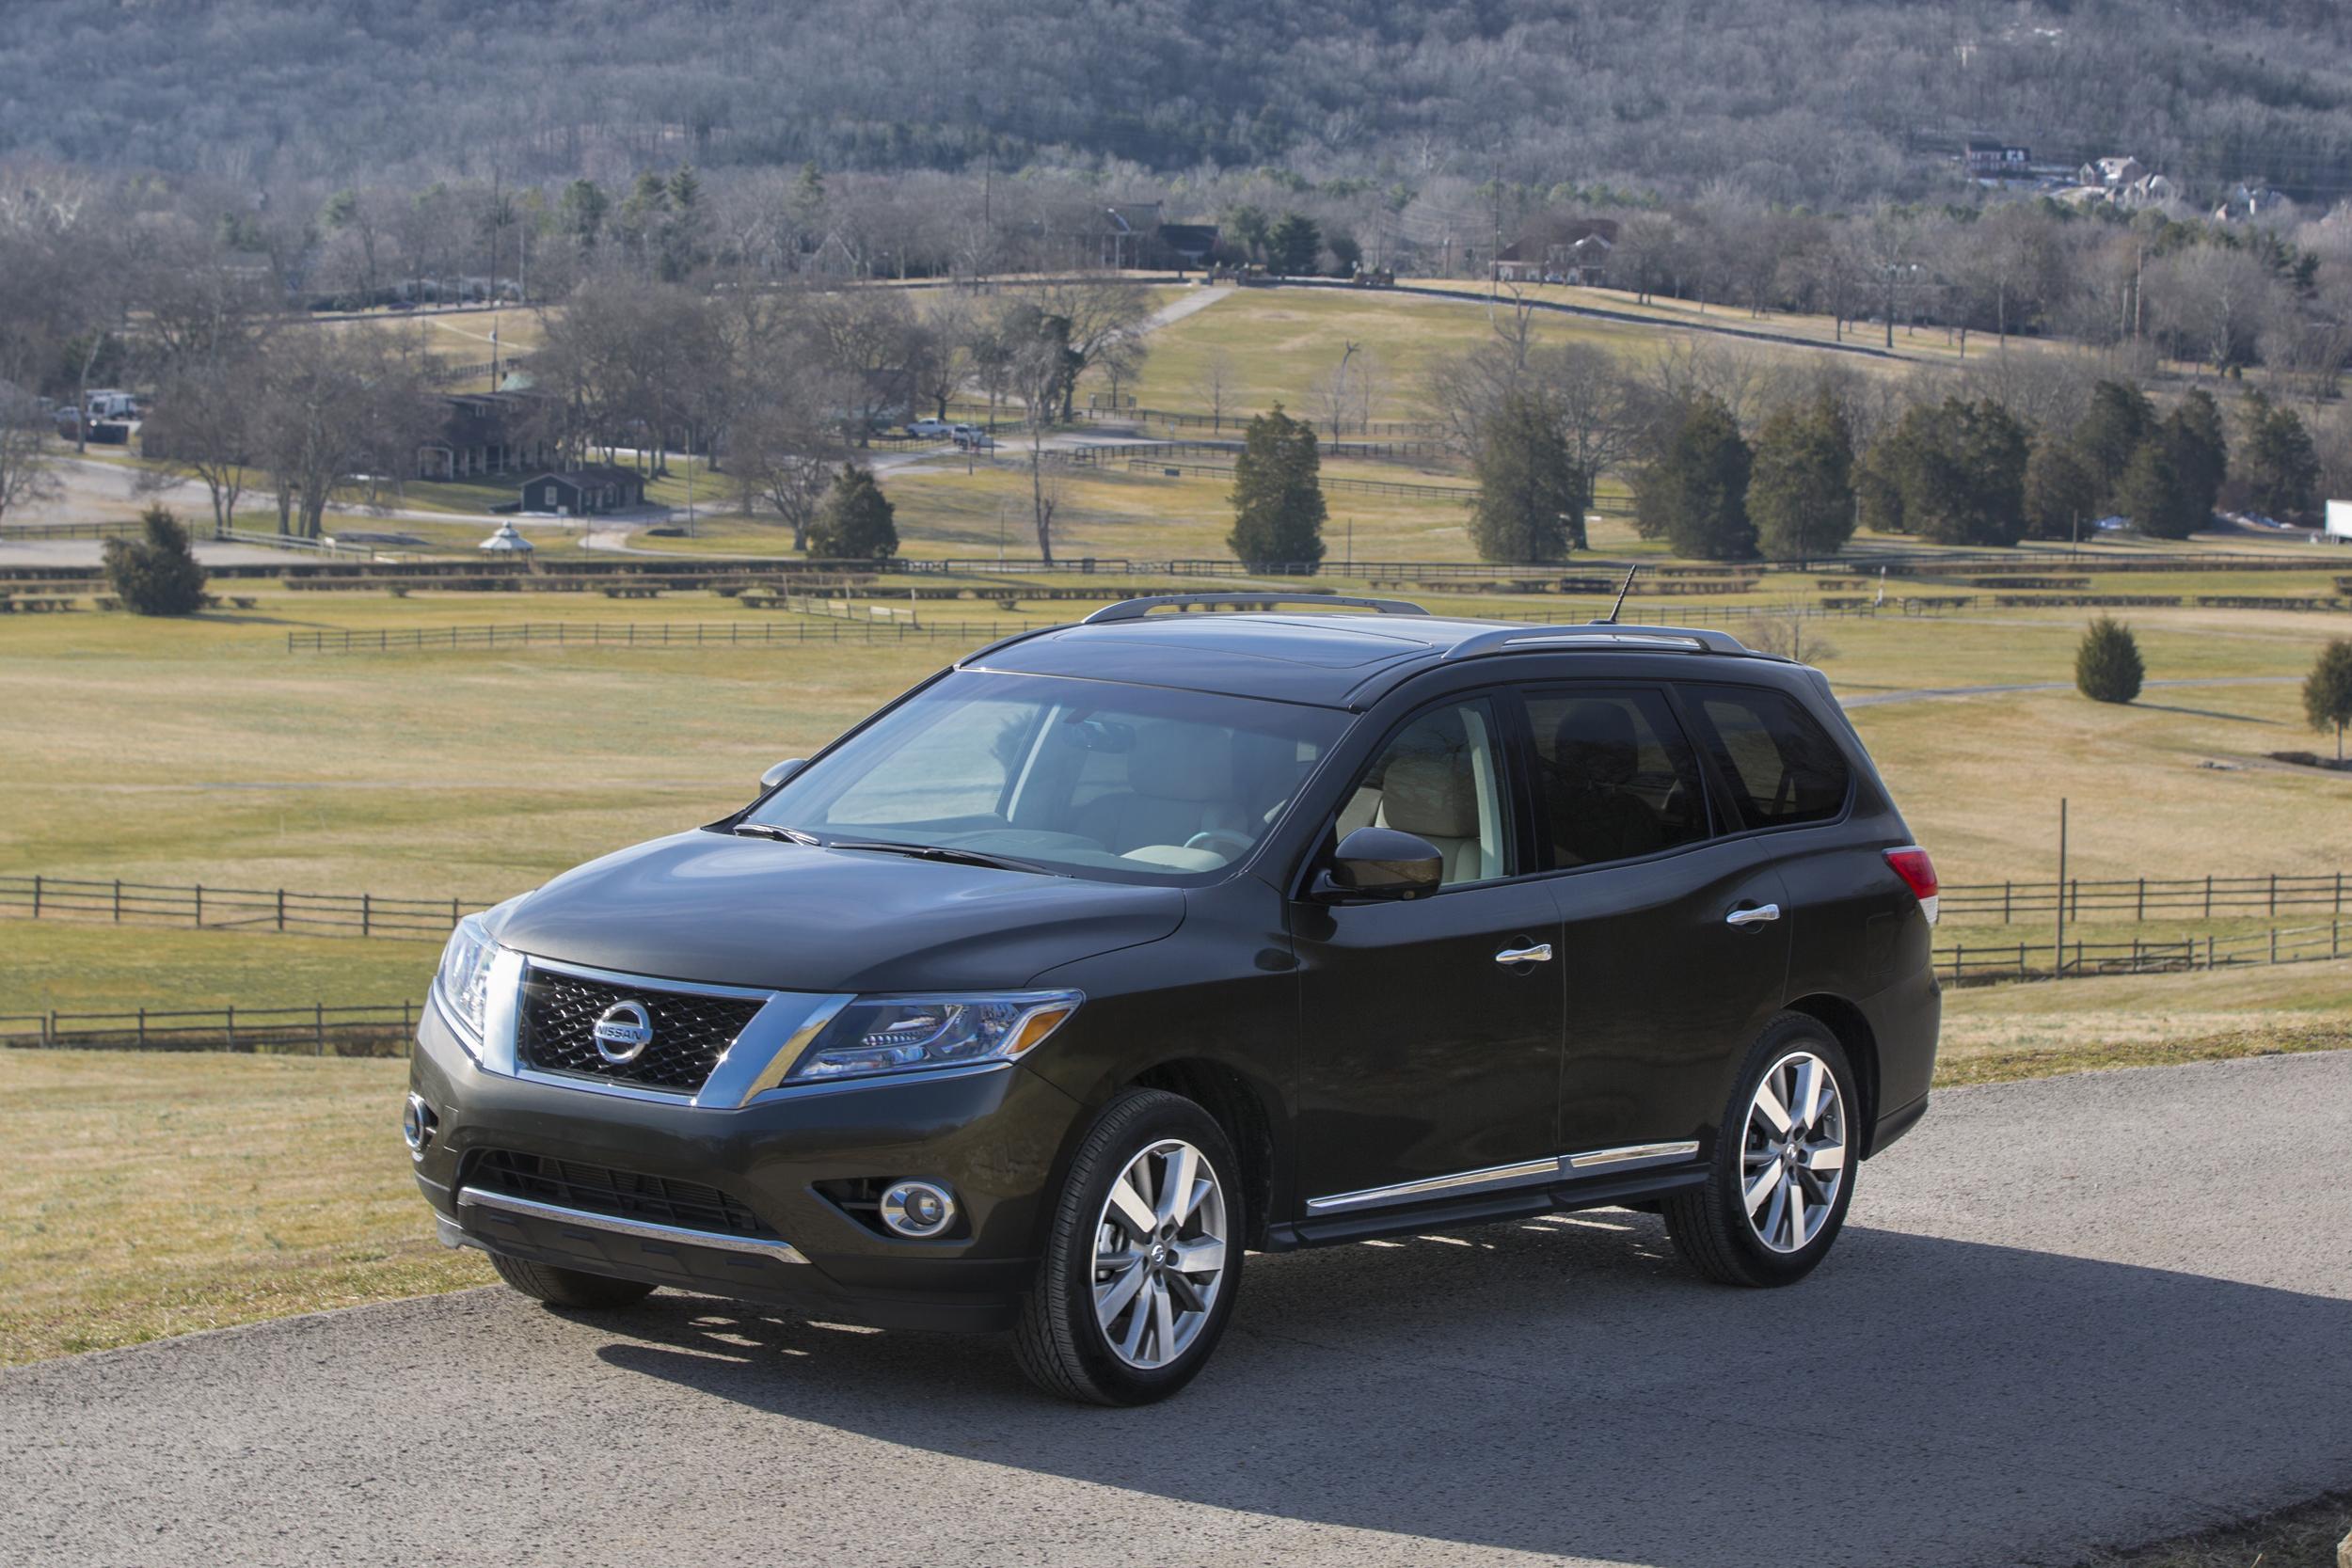 Nissan PATHFINDER 2015 International Price & Overview